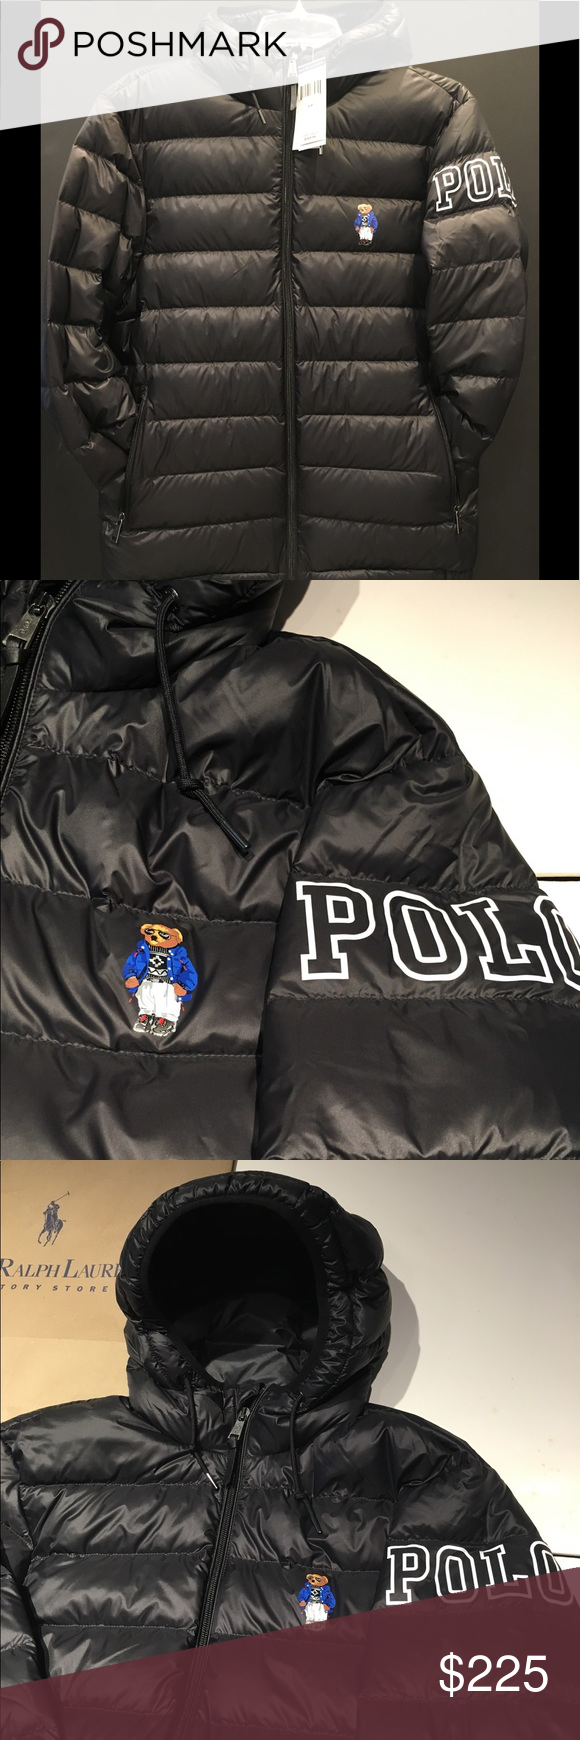 ecb3f9a87 Limited Edition Polo Bear Ski Bear Down Jacket EXTREMELY RARE